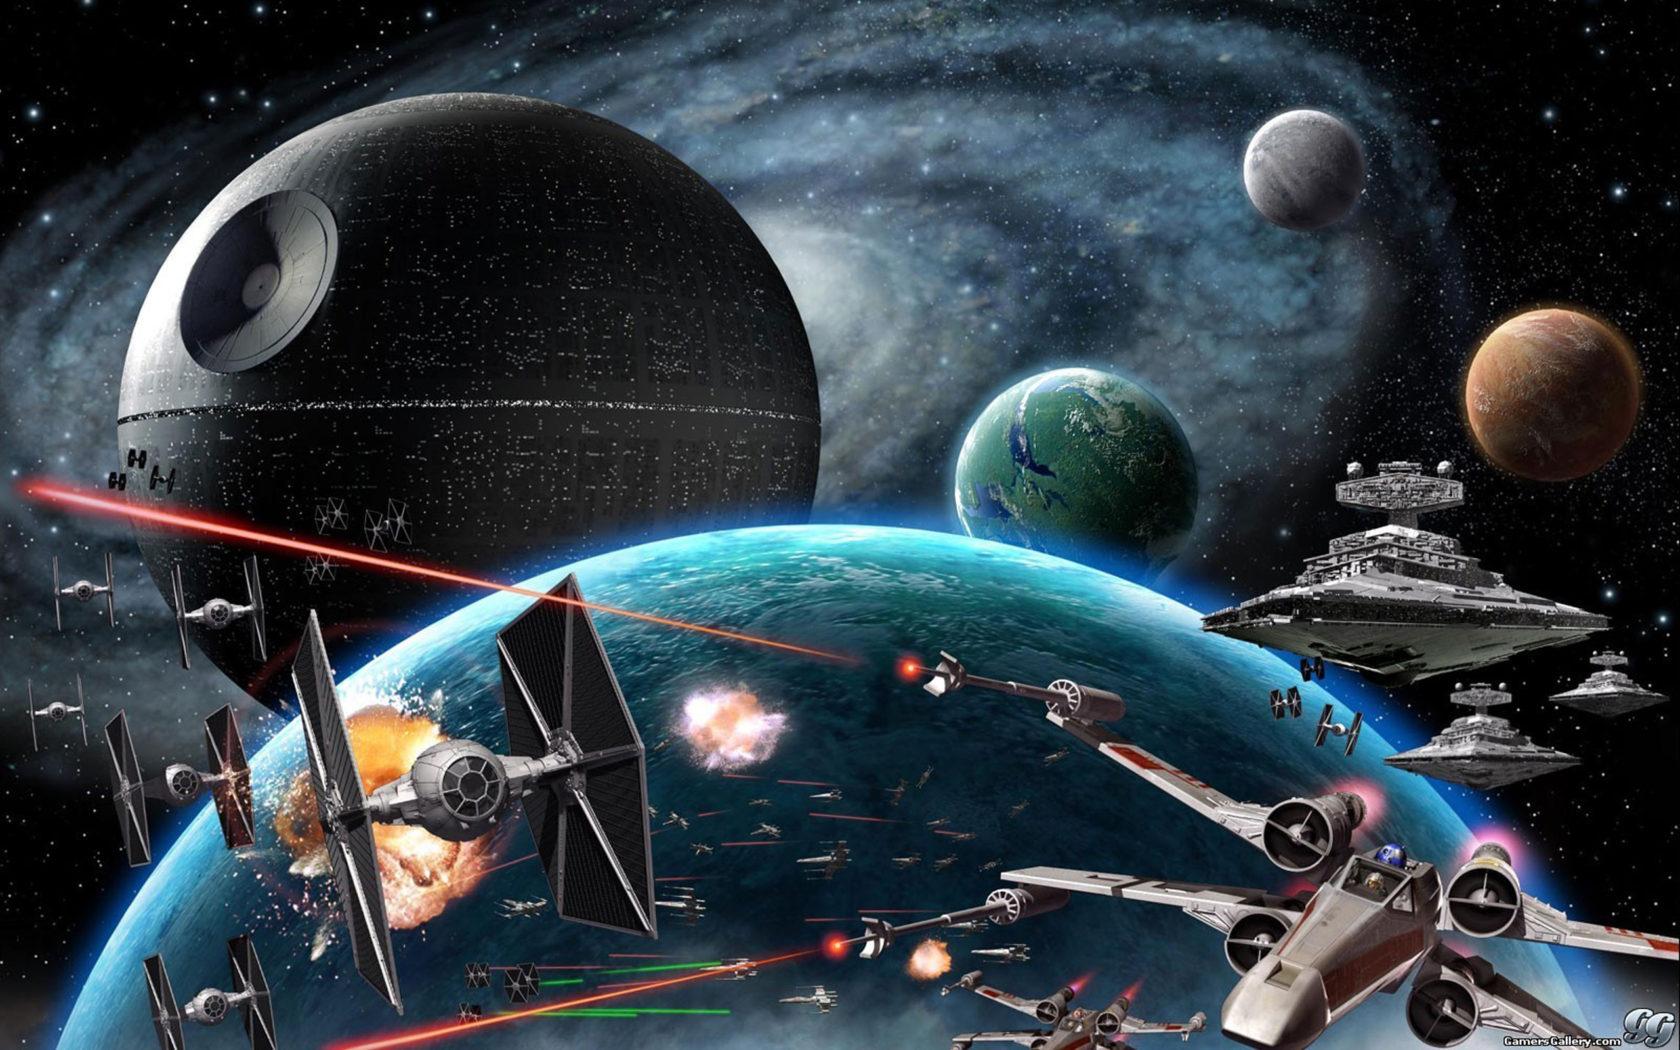 Star Wars The Last Jedi Wallpaper Iphone X Star Wars Empire At War Elite Fighter Aircraft Laser Shots